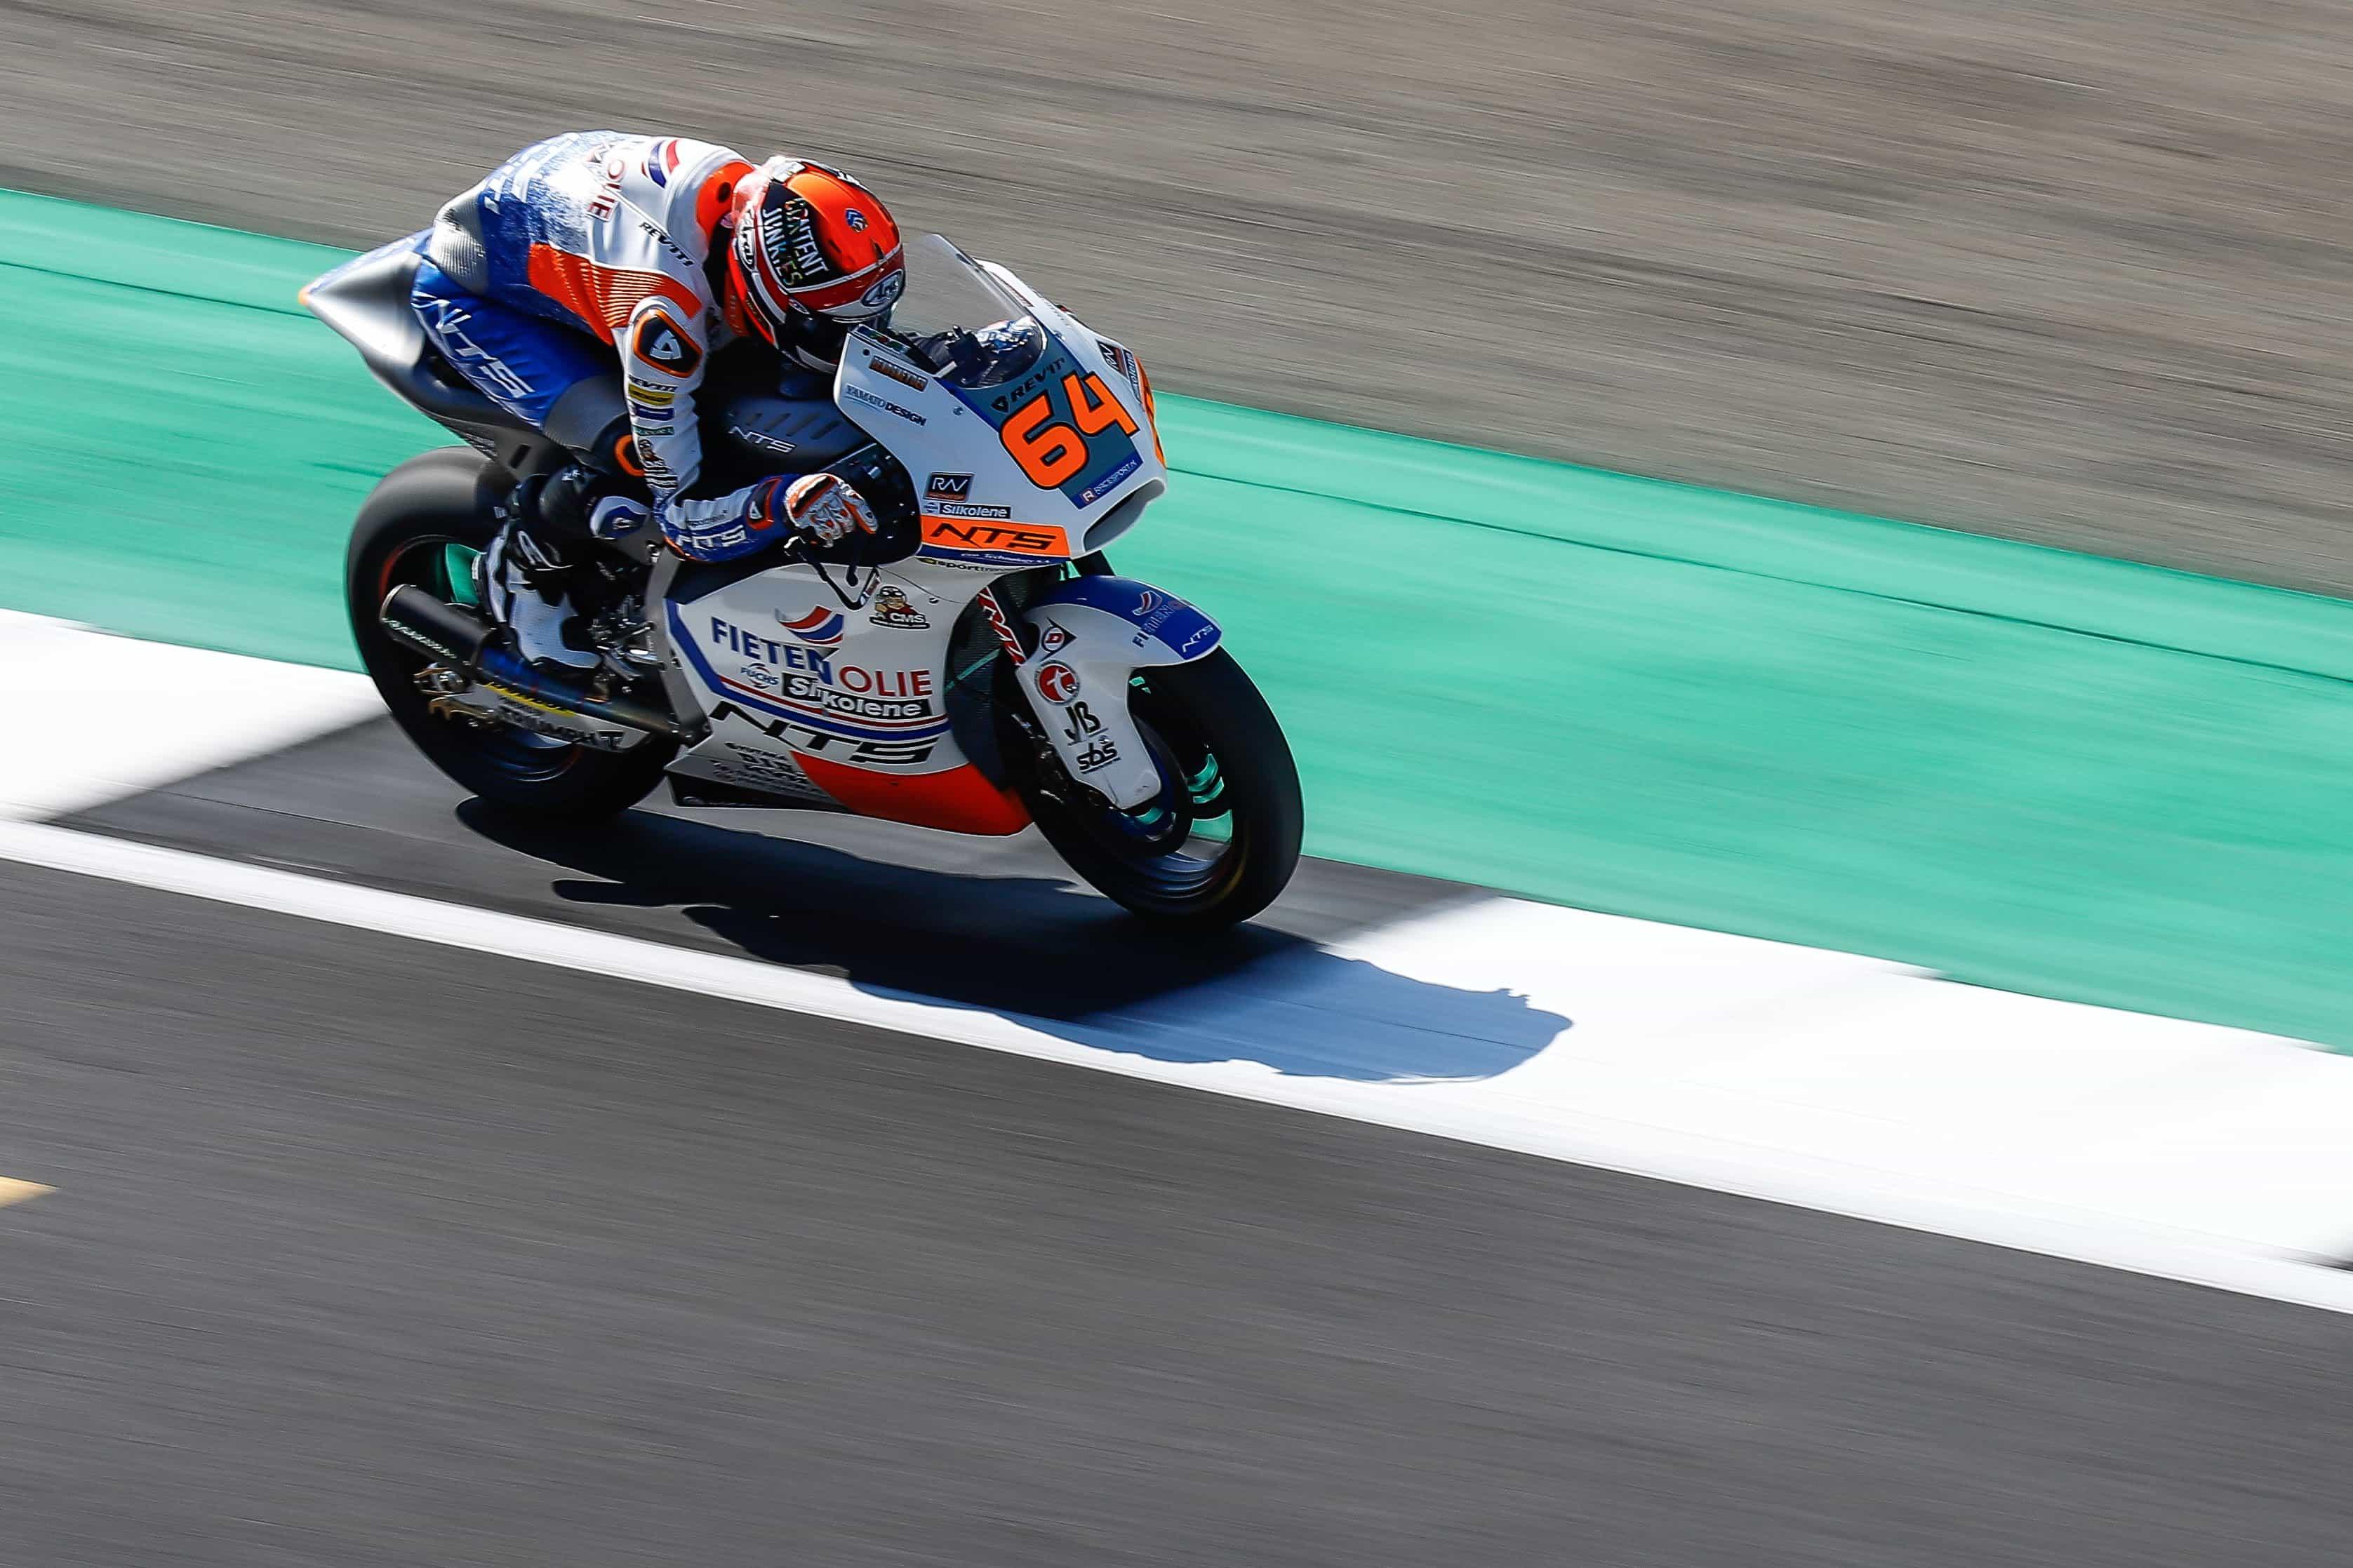 NTS RW Racing GP イギリスGP 公式練習1、公式練習2レポート